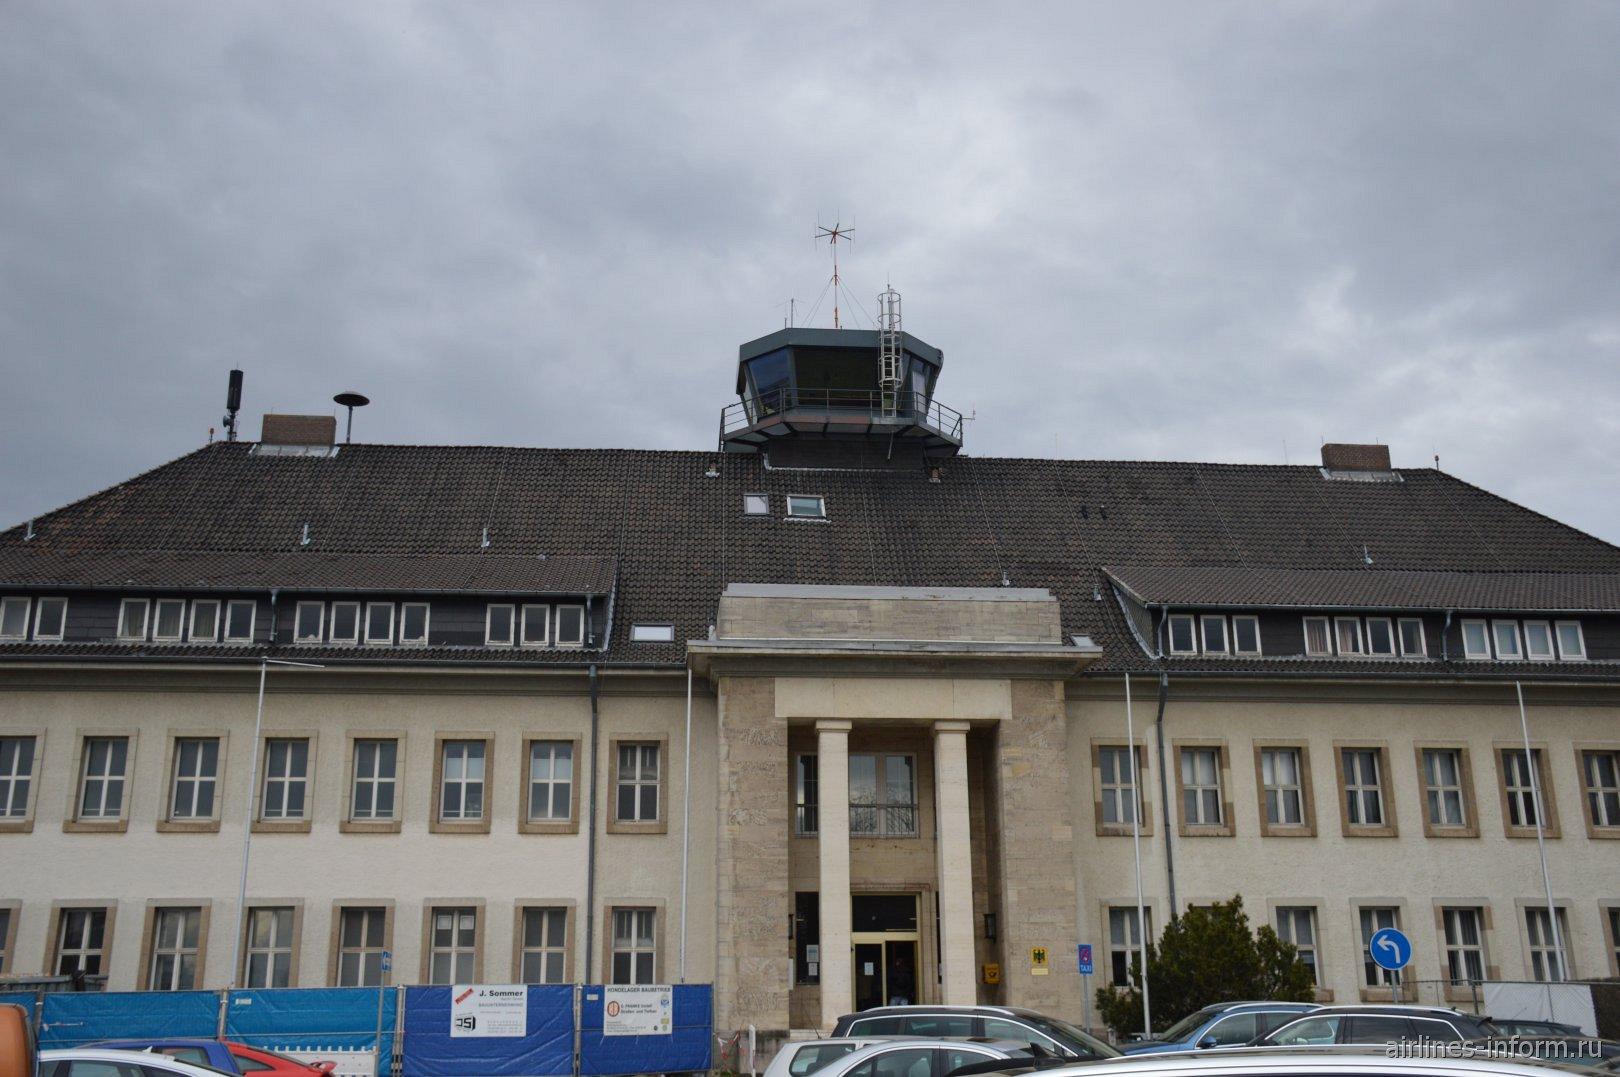 Пассажирский терминал аэропорта Брауншвайг-Вольфсбург